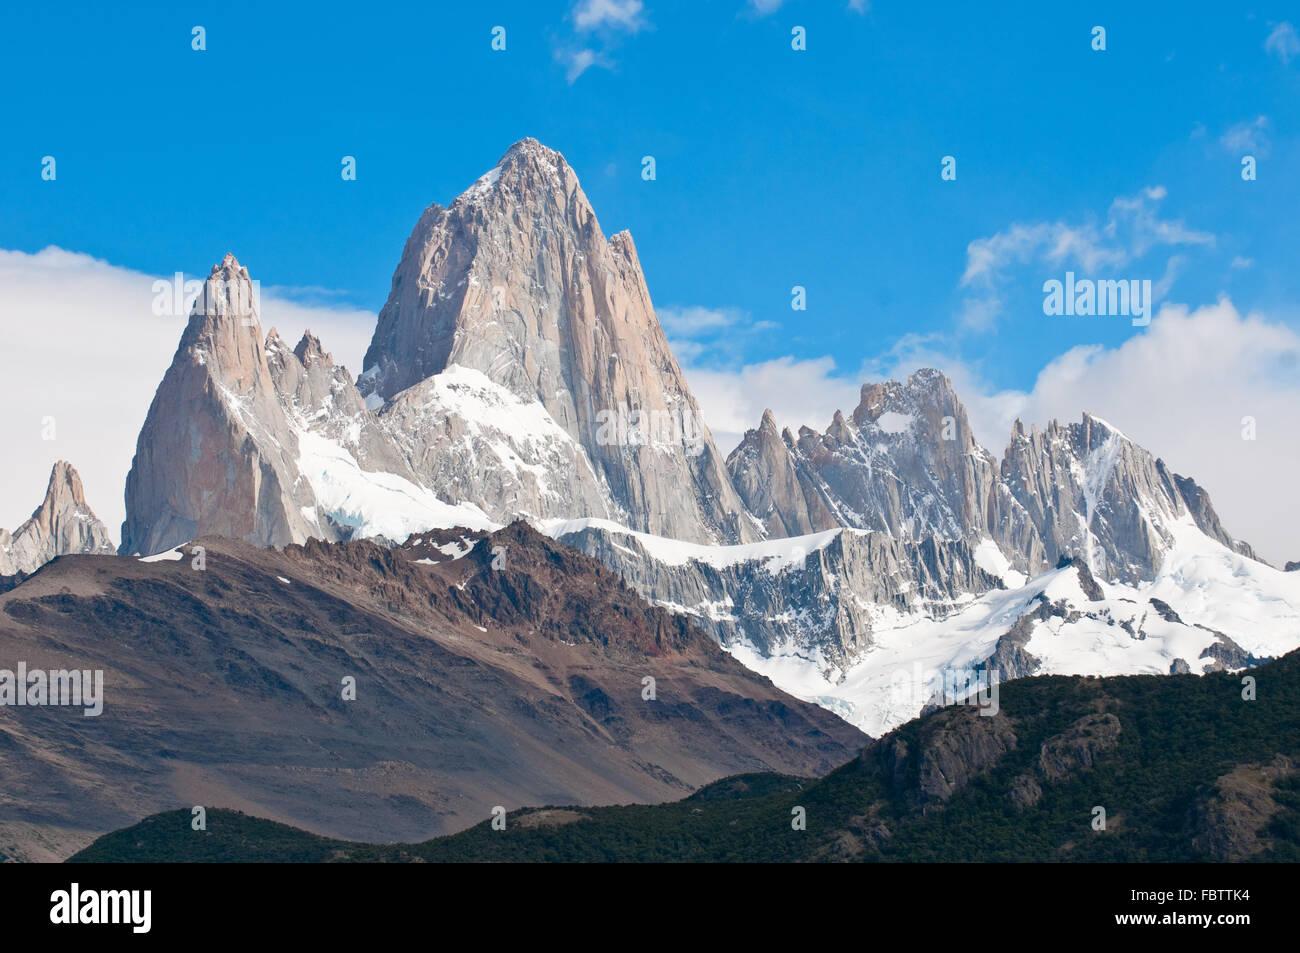 Fitz Roy mountain and Laguna de los Tres, Patagonia, Argentina - Stock Image